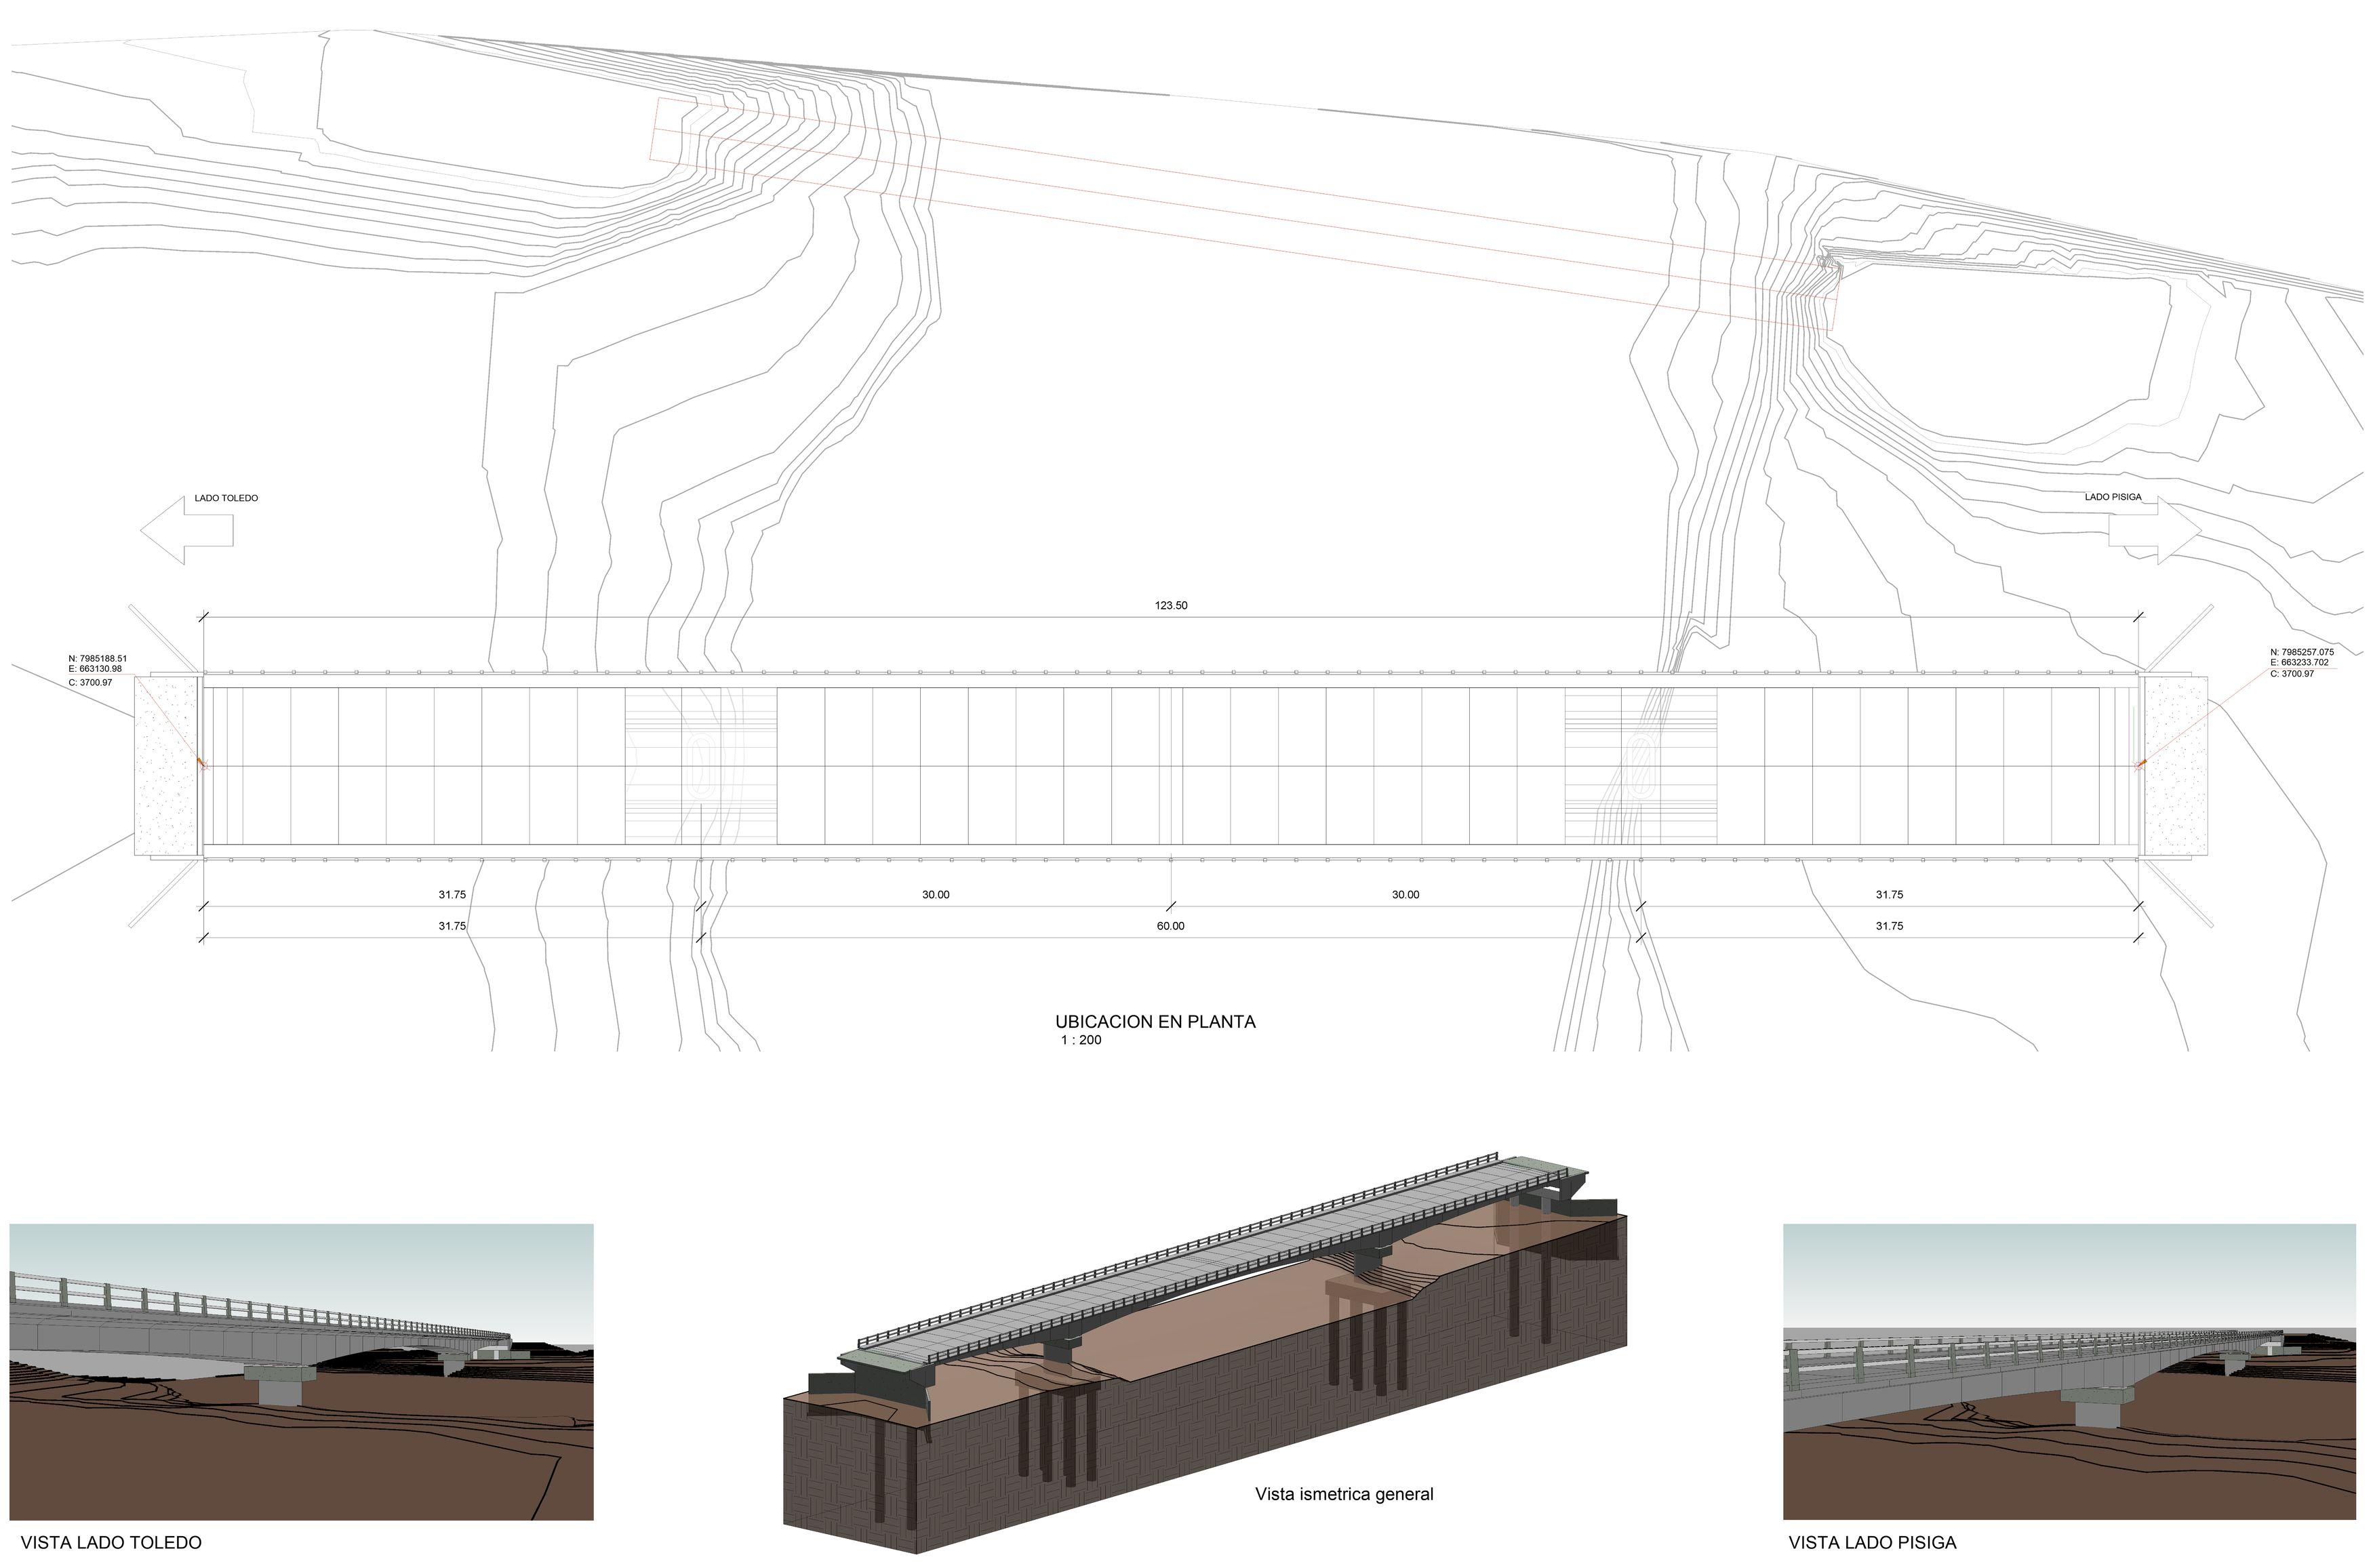 133---modelo-puente-rev30---plano---1---plano-de-ubicacion-3500-3500